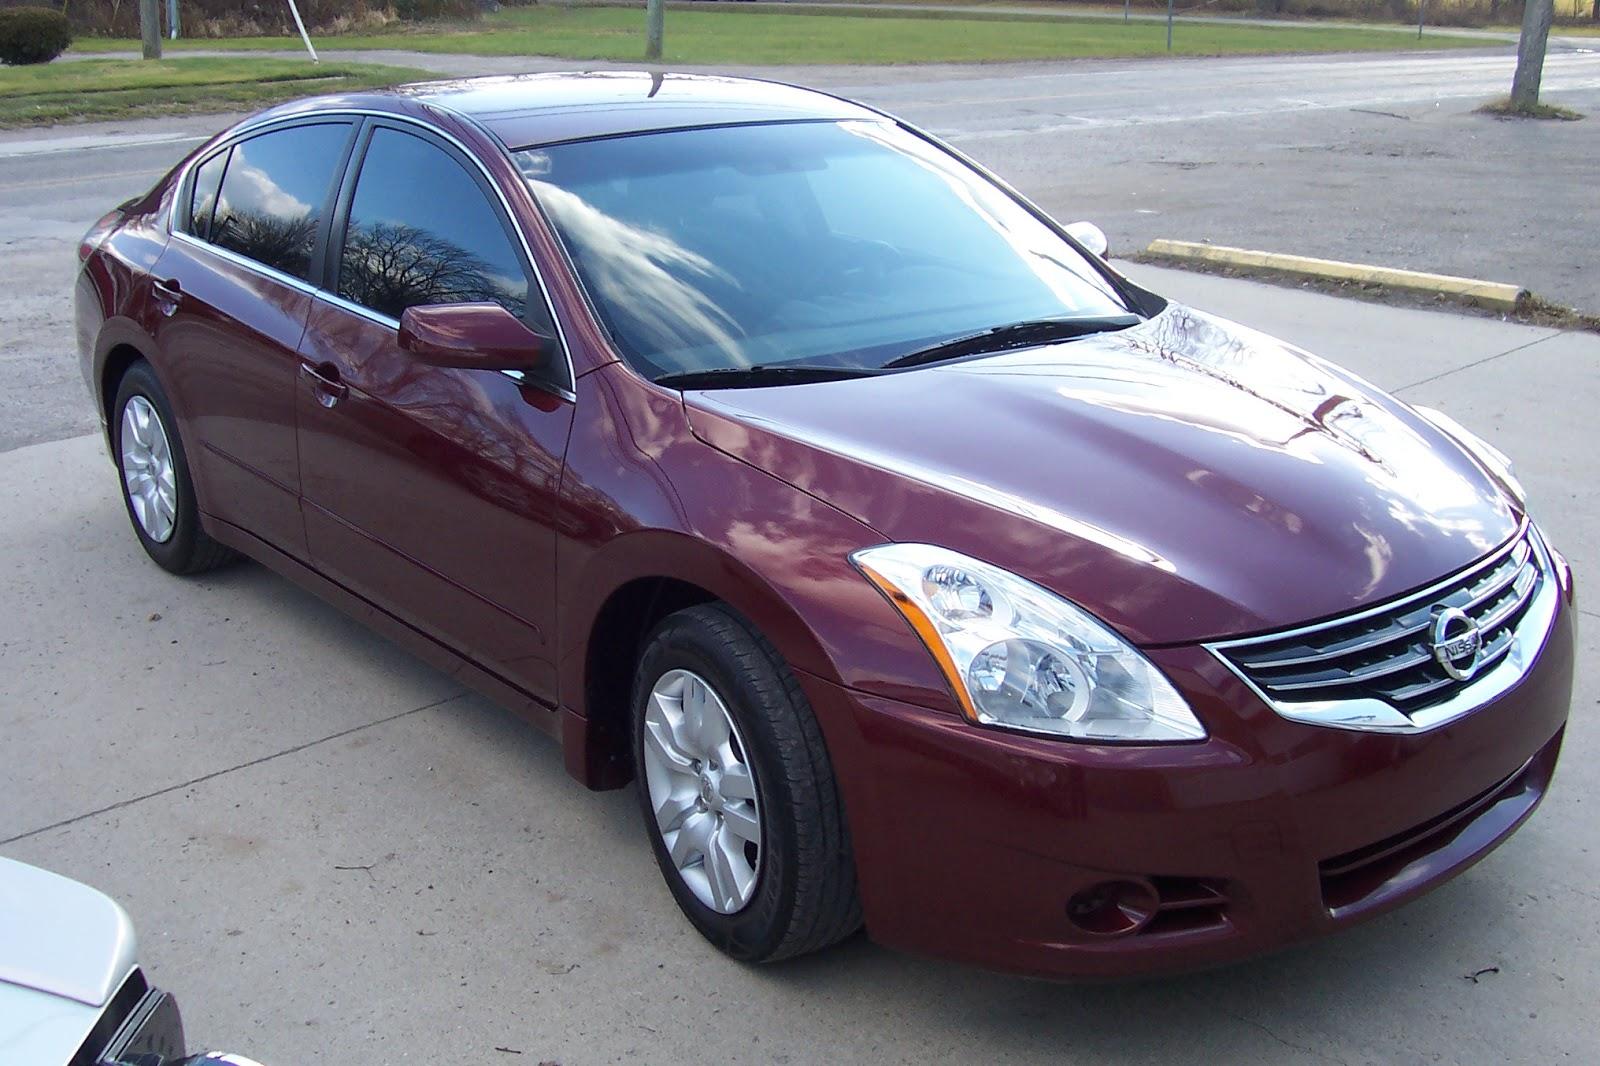 Used Car Sales Select Motor Care Auto Repair Towing